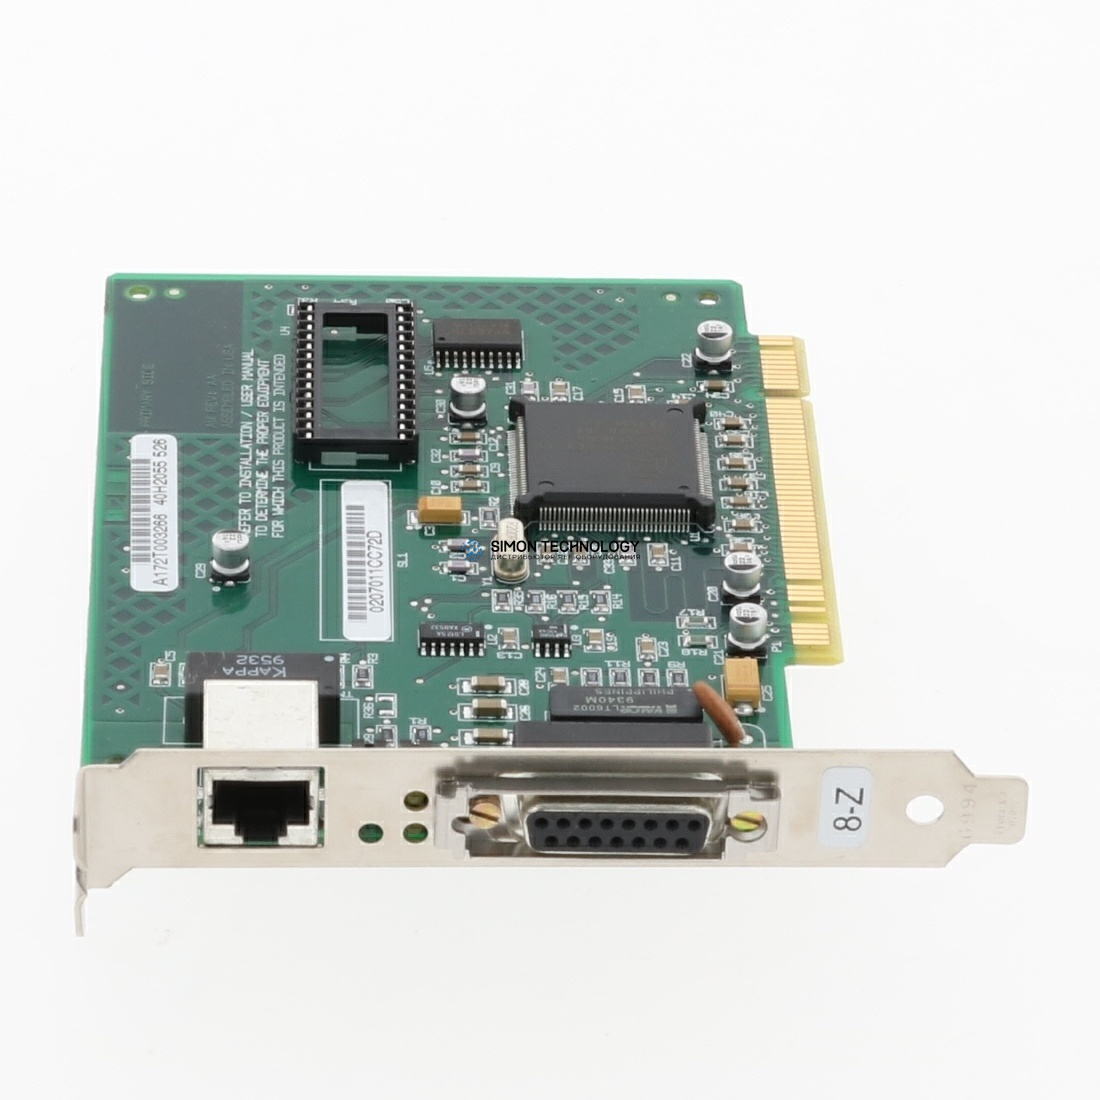 Сетевая карта IBM Ethernet adapter PCI (11G8138)